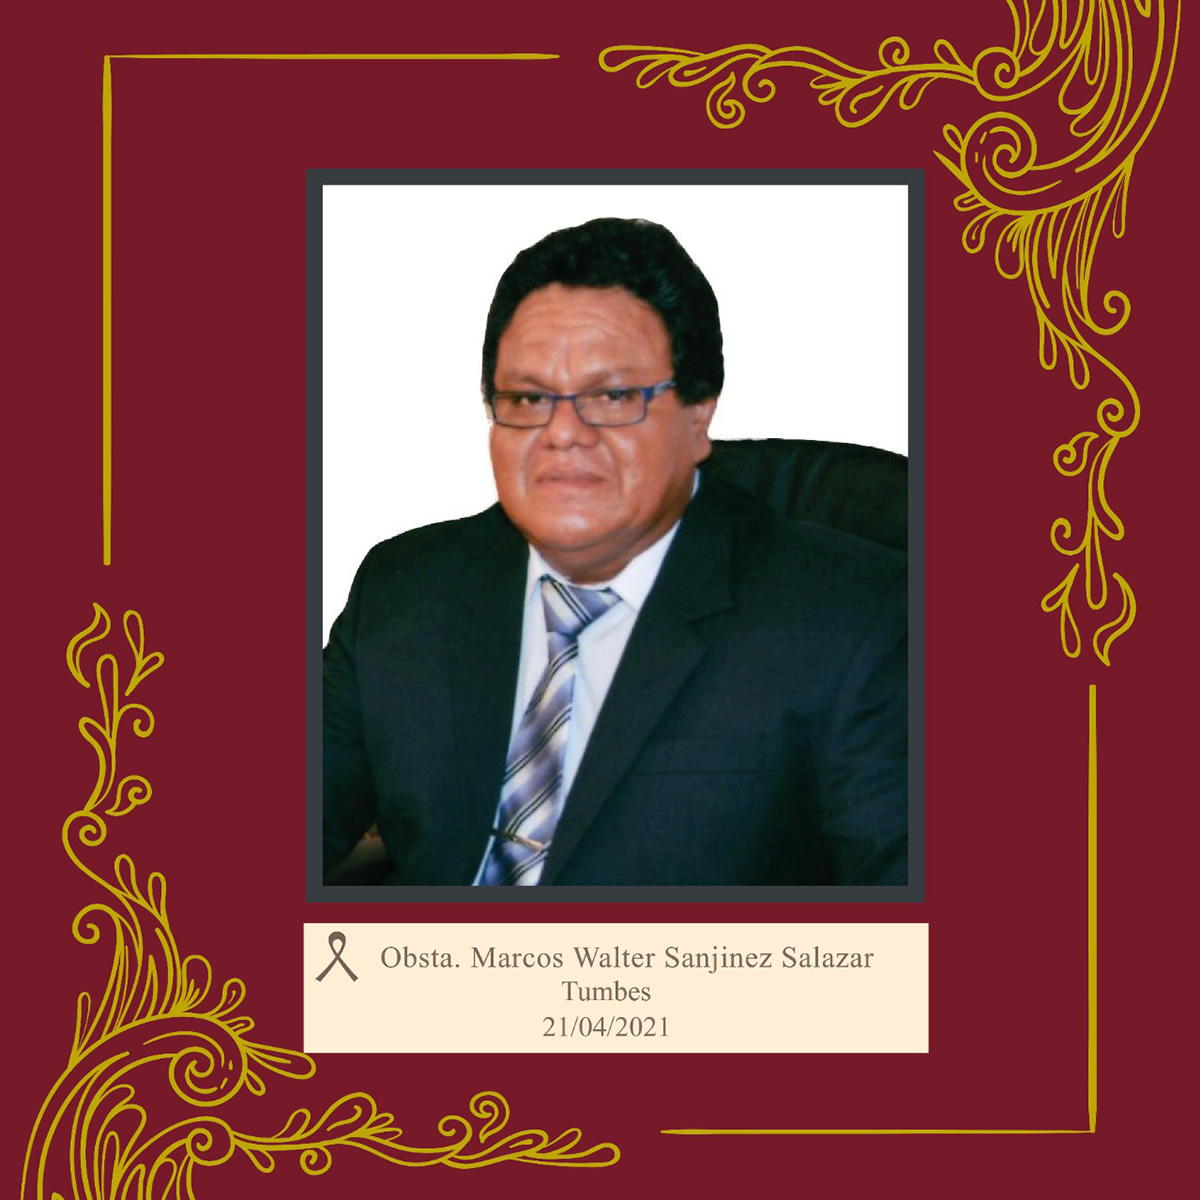 Marcos Walter Sanjinez Salazar